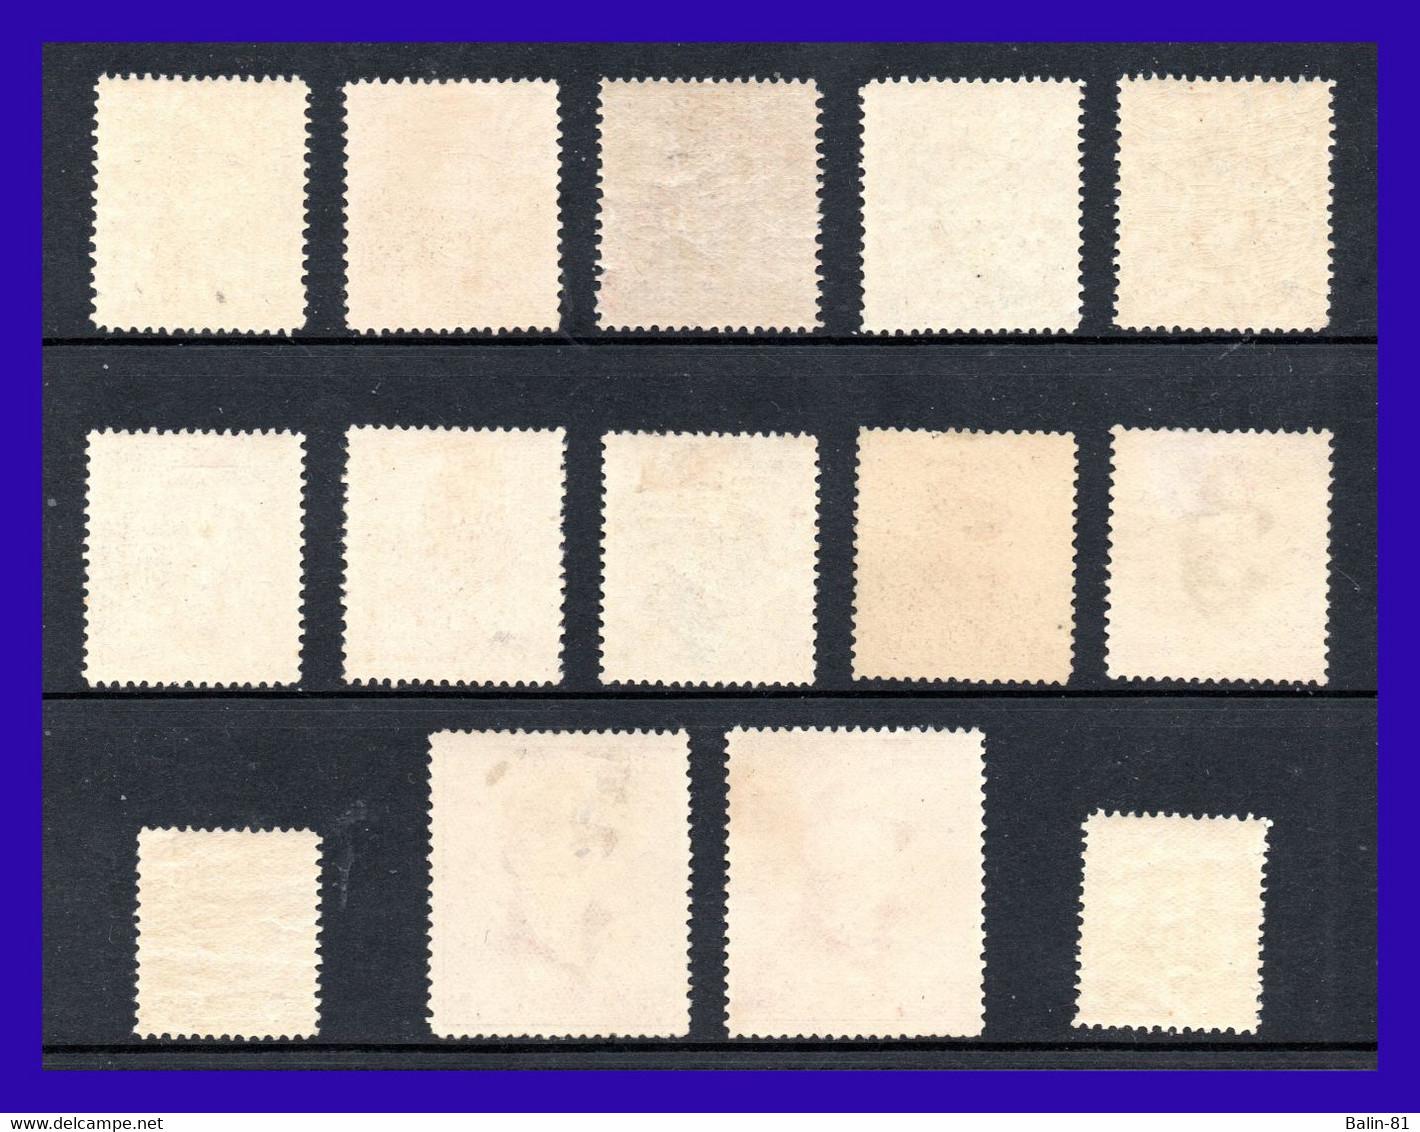 1919 - Belgica - Scott Nº 124 / 137 - MNH - Valor Catalogo 1400 $ - Gran Lujo - BE- 31 - Unused Stamps